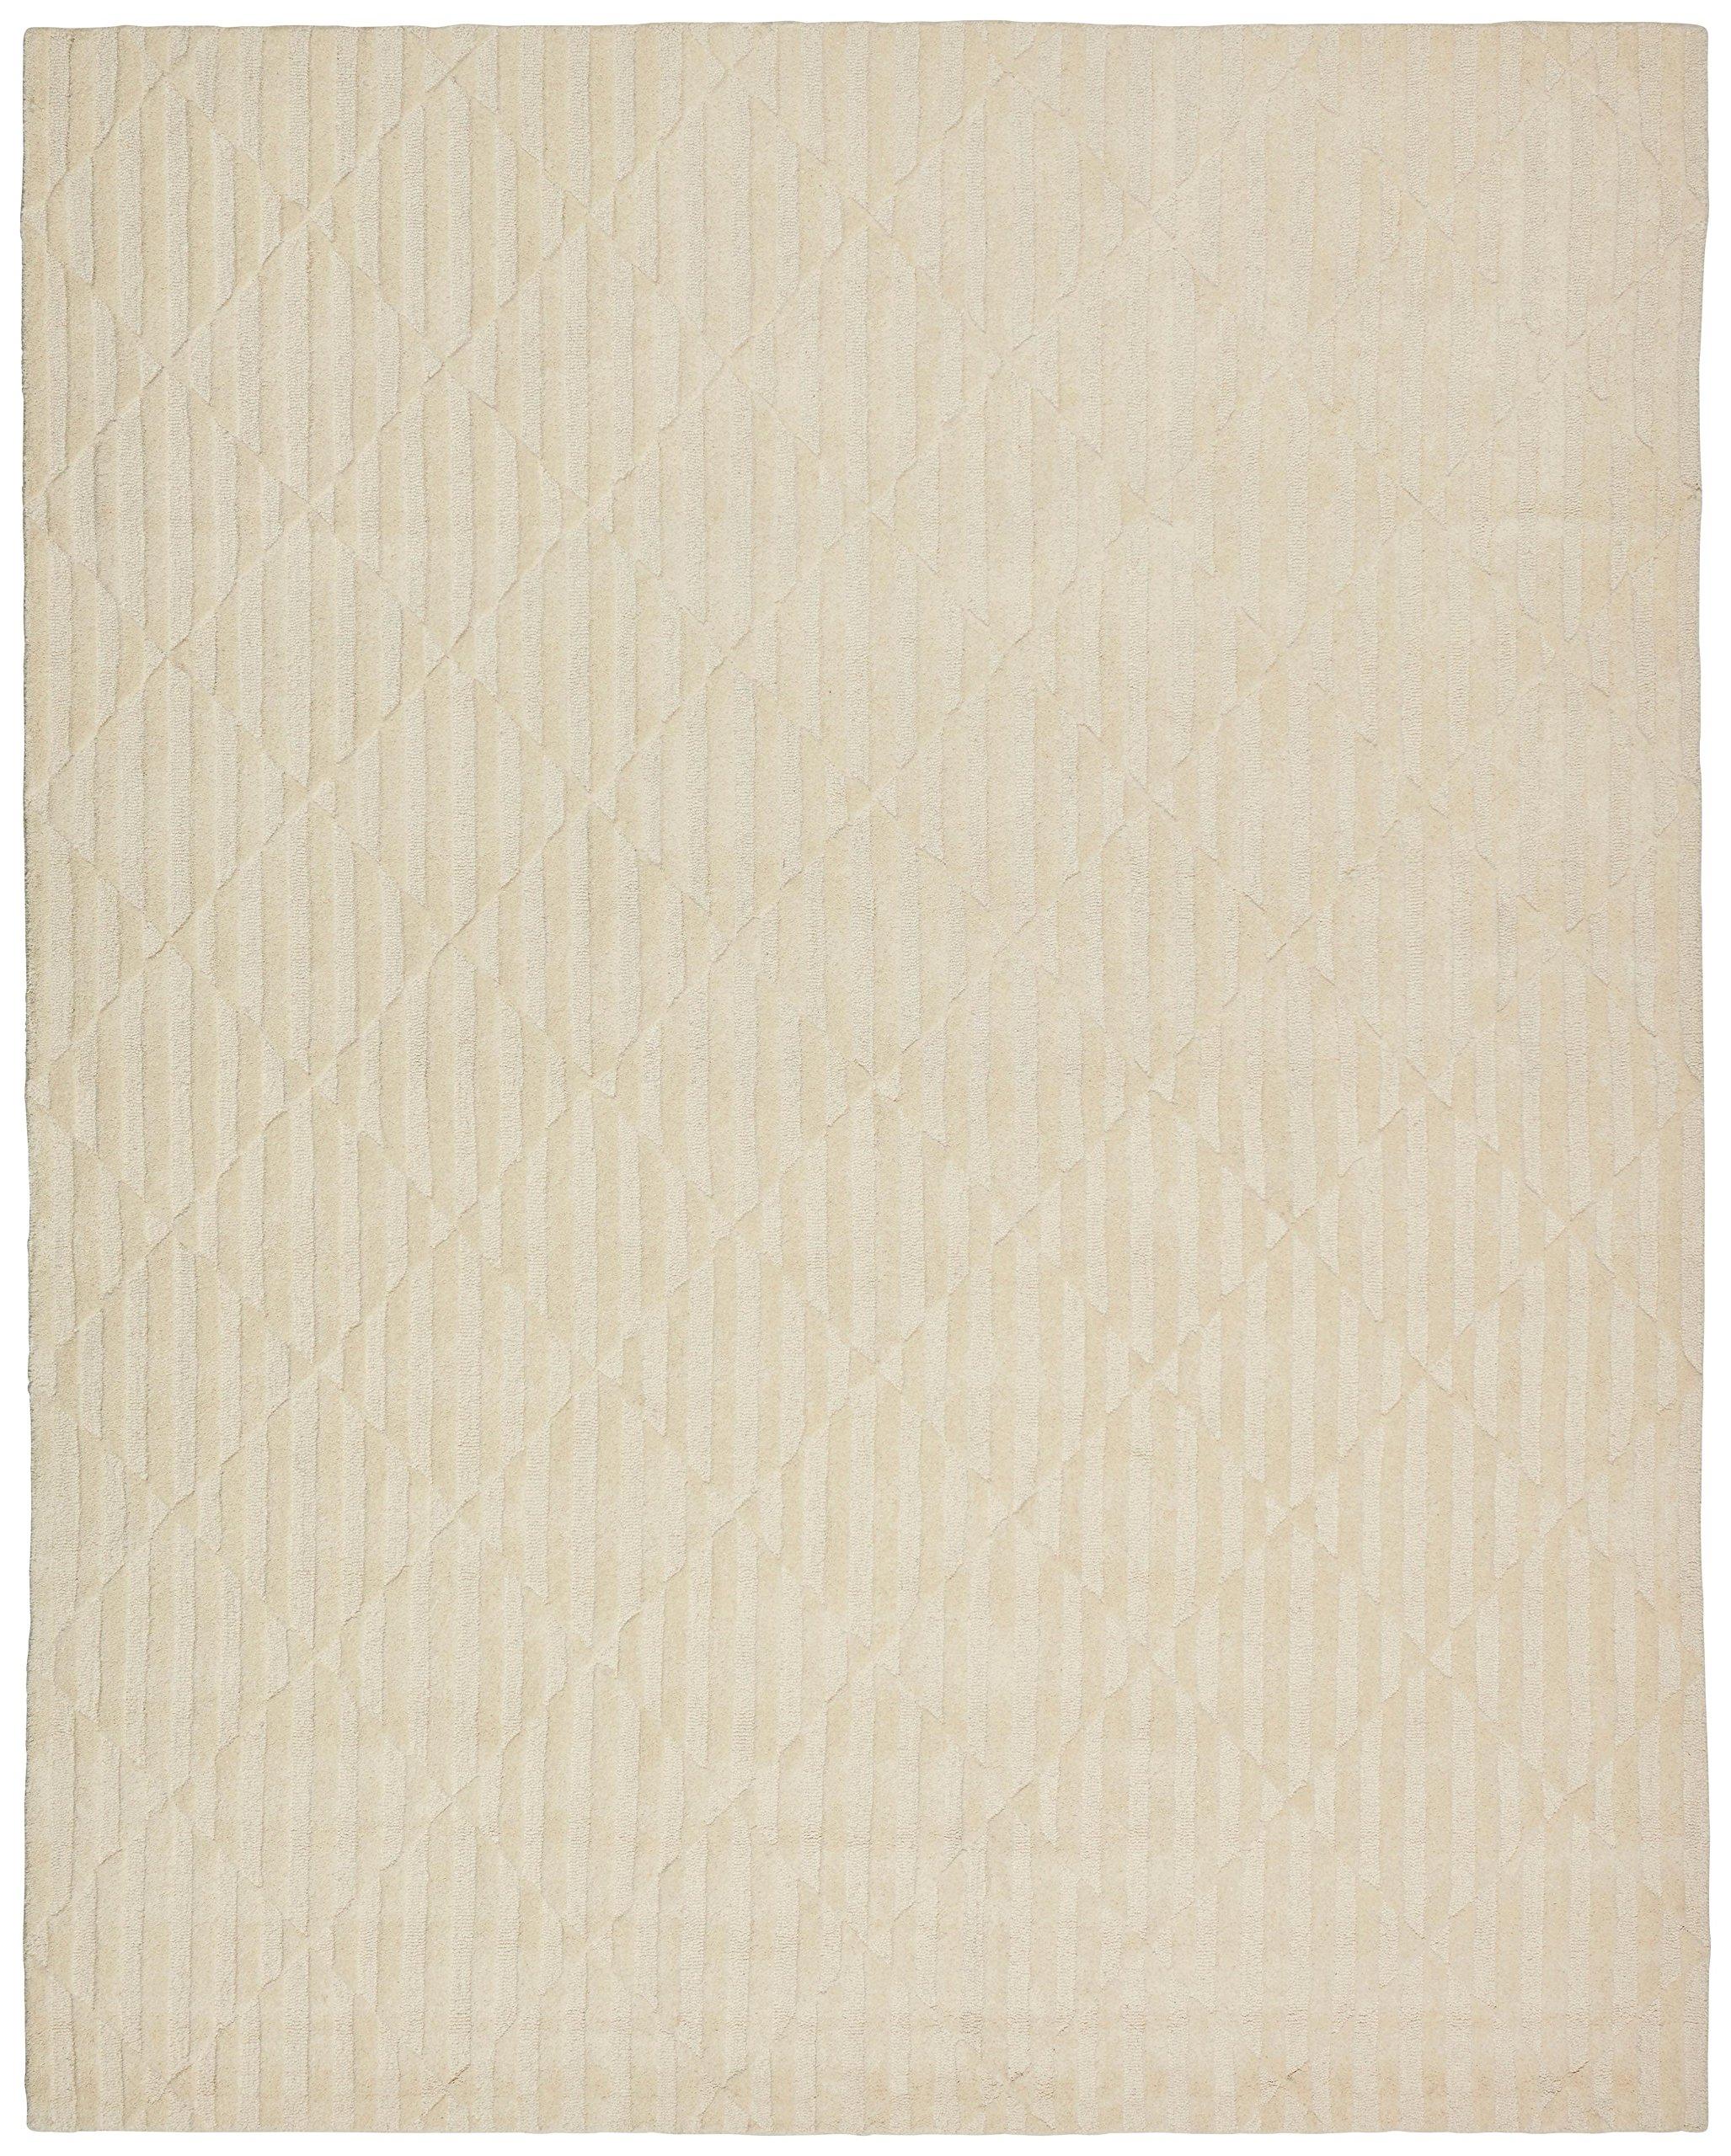 Rivet Geometric Criss-Cross Woven Wool Area Rug, 8' x 10', Cream